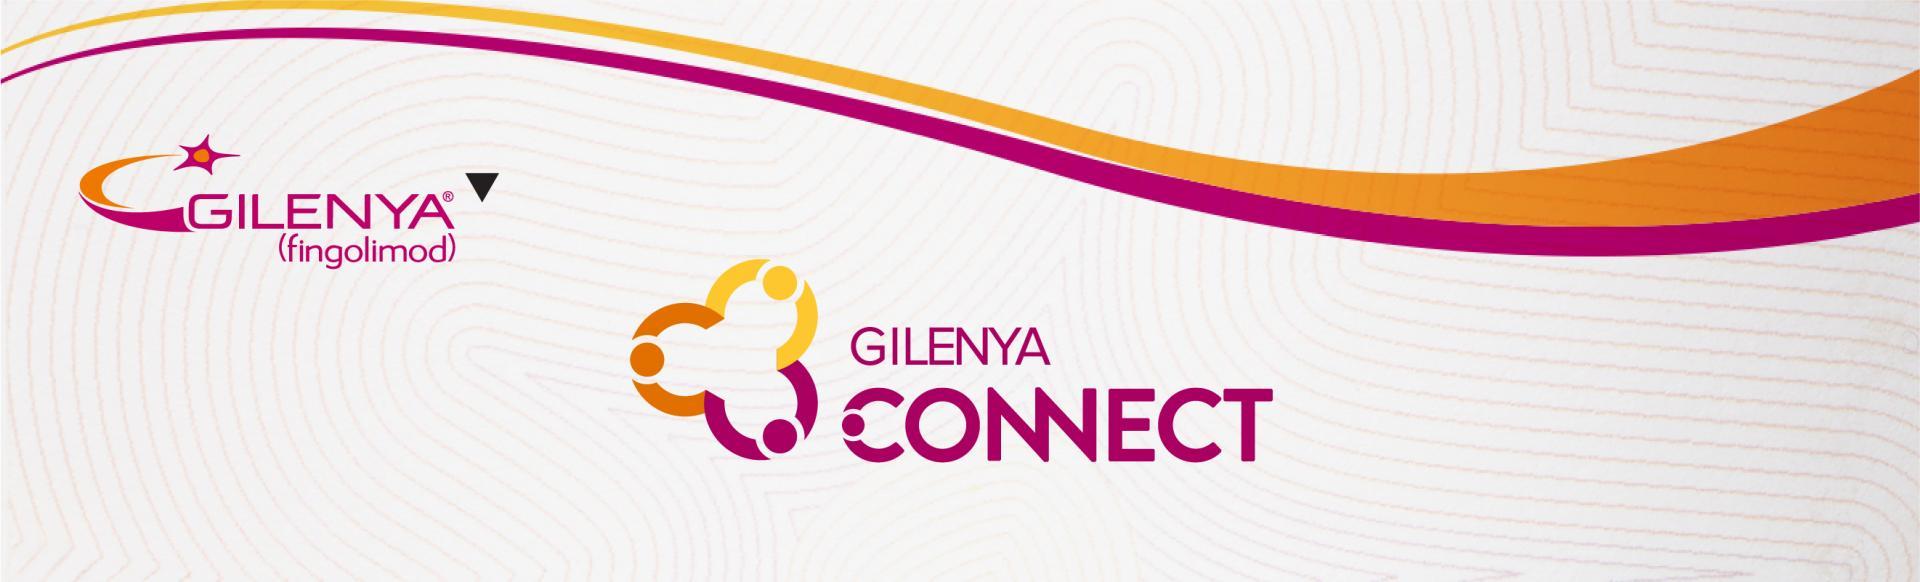 gilenya-connect-hero-banner